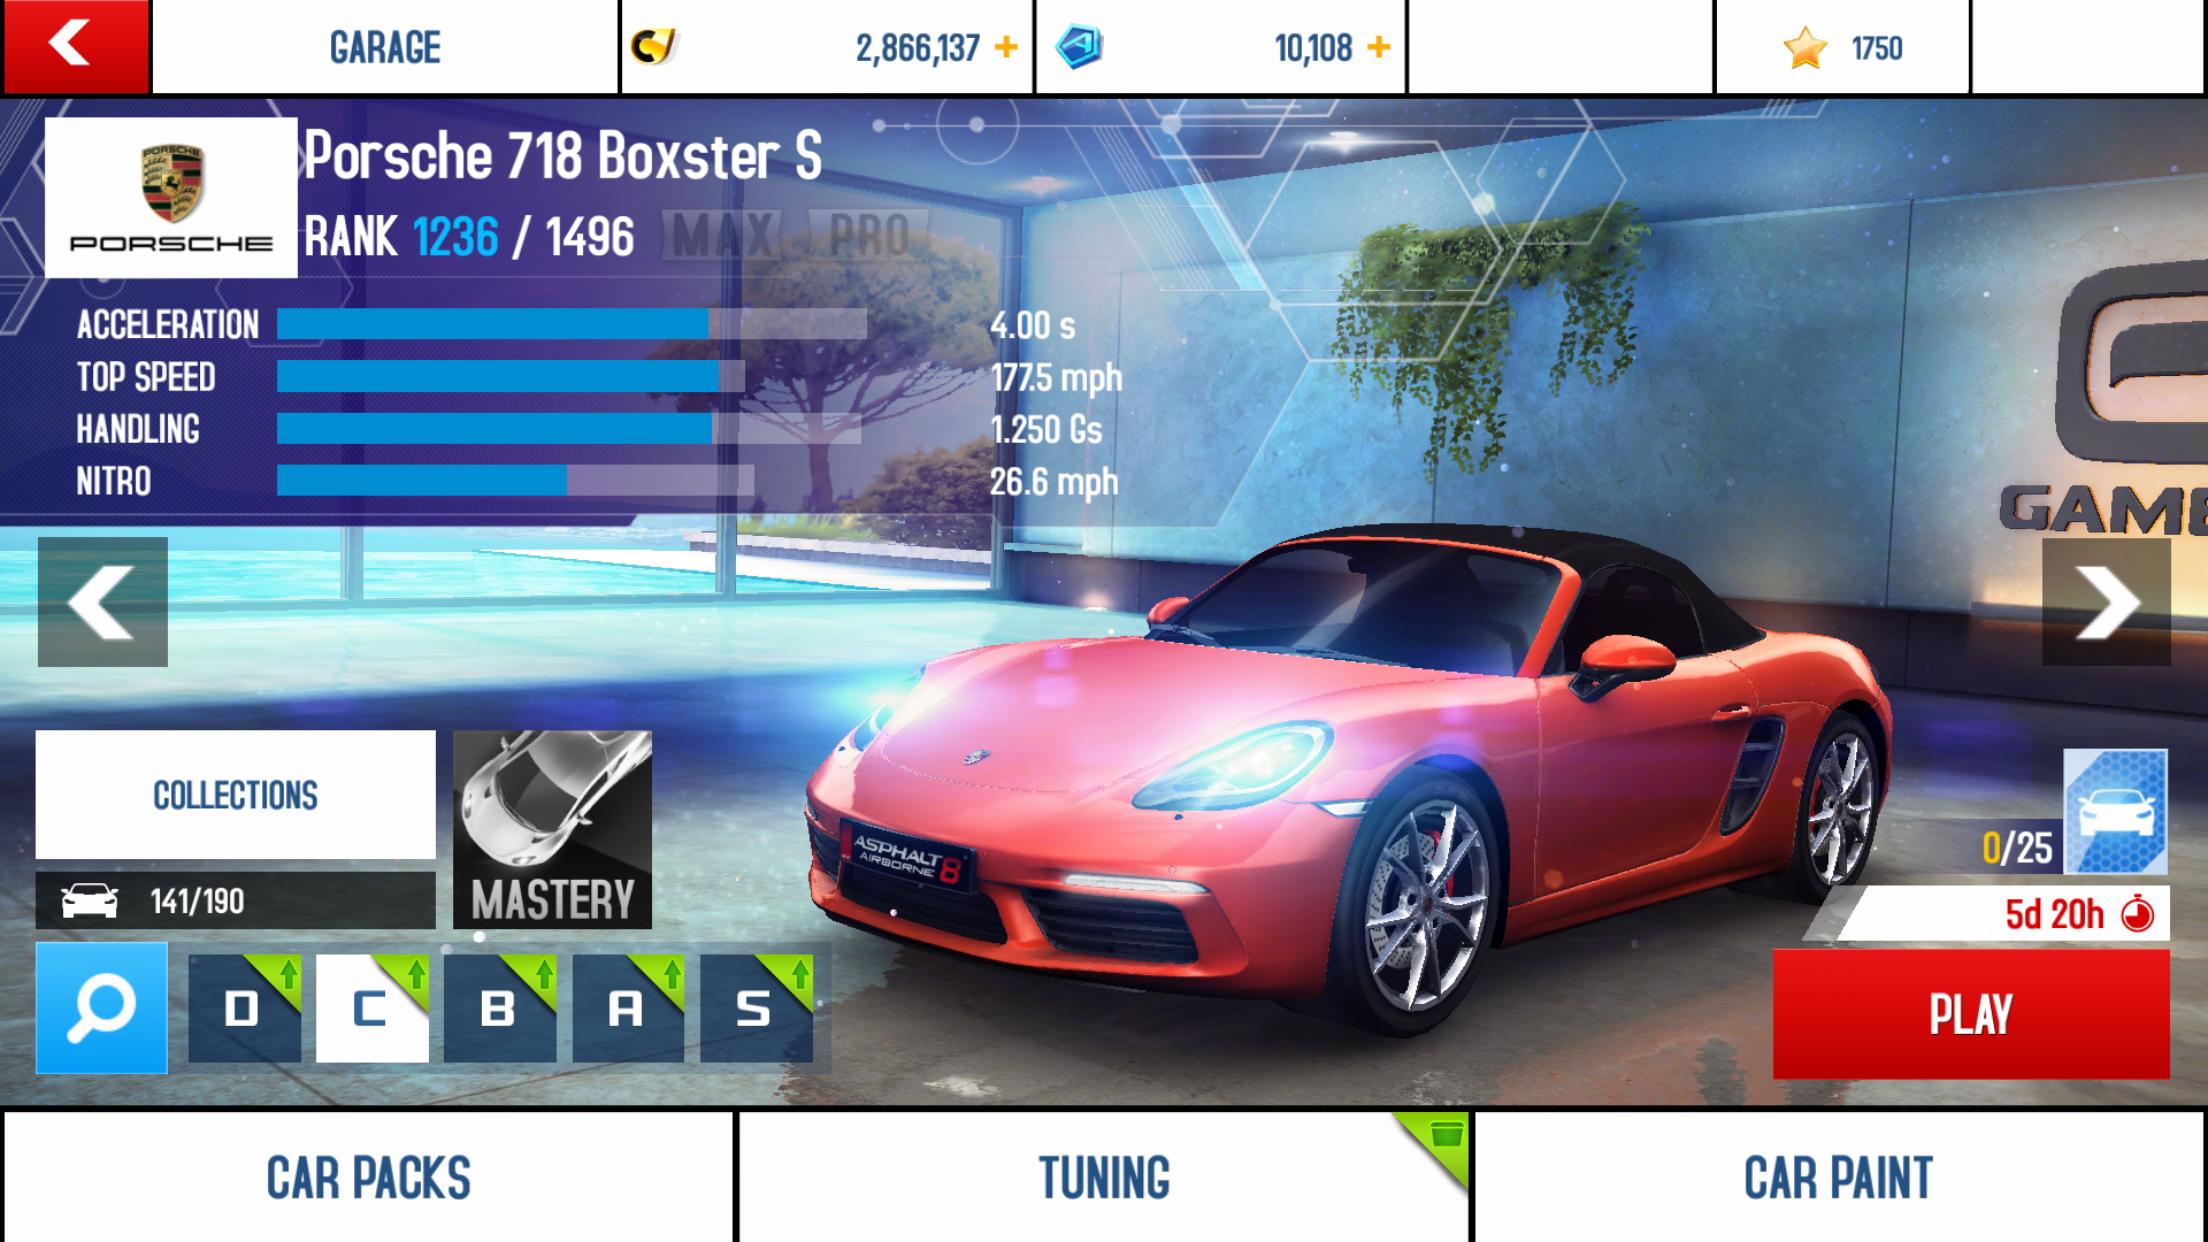 Porsche 718 Boxster S | Asphalt Wiki | FANDOM powered by Wikia on ariel atom blueprints, porsche gt3 blueprints, ac cobra blueprints, hummer blueprints, gmc blueprints, nissan blueprints, honda blueprints, porsche suv blueprints, chrysler blueprints, mazda blueprints,